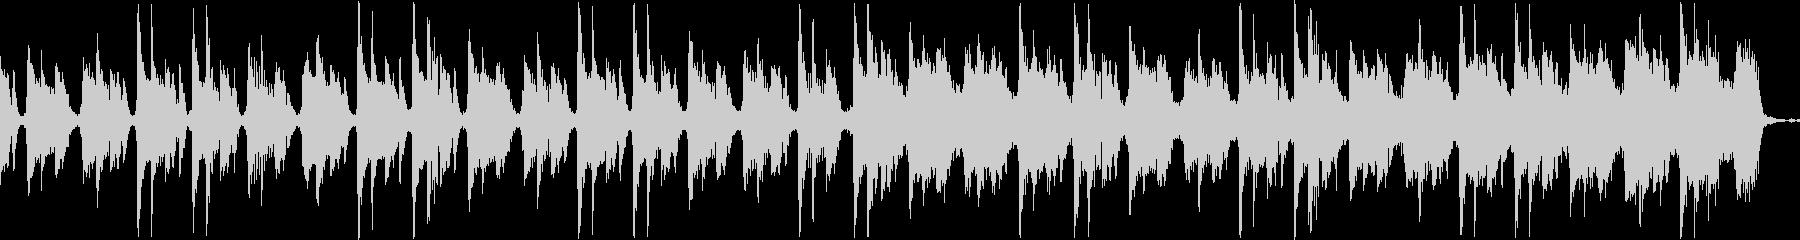 【CM】クールなエレクトロBGM・9の未再生の波形